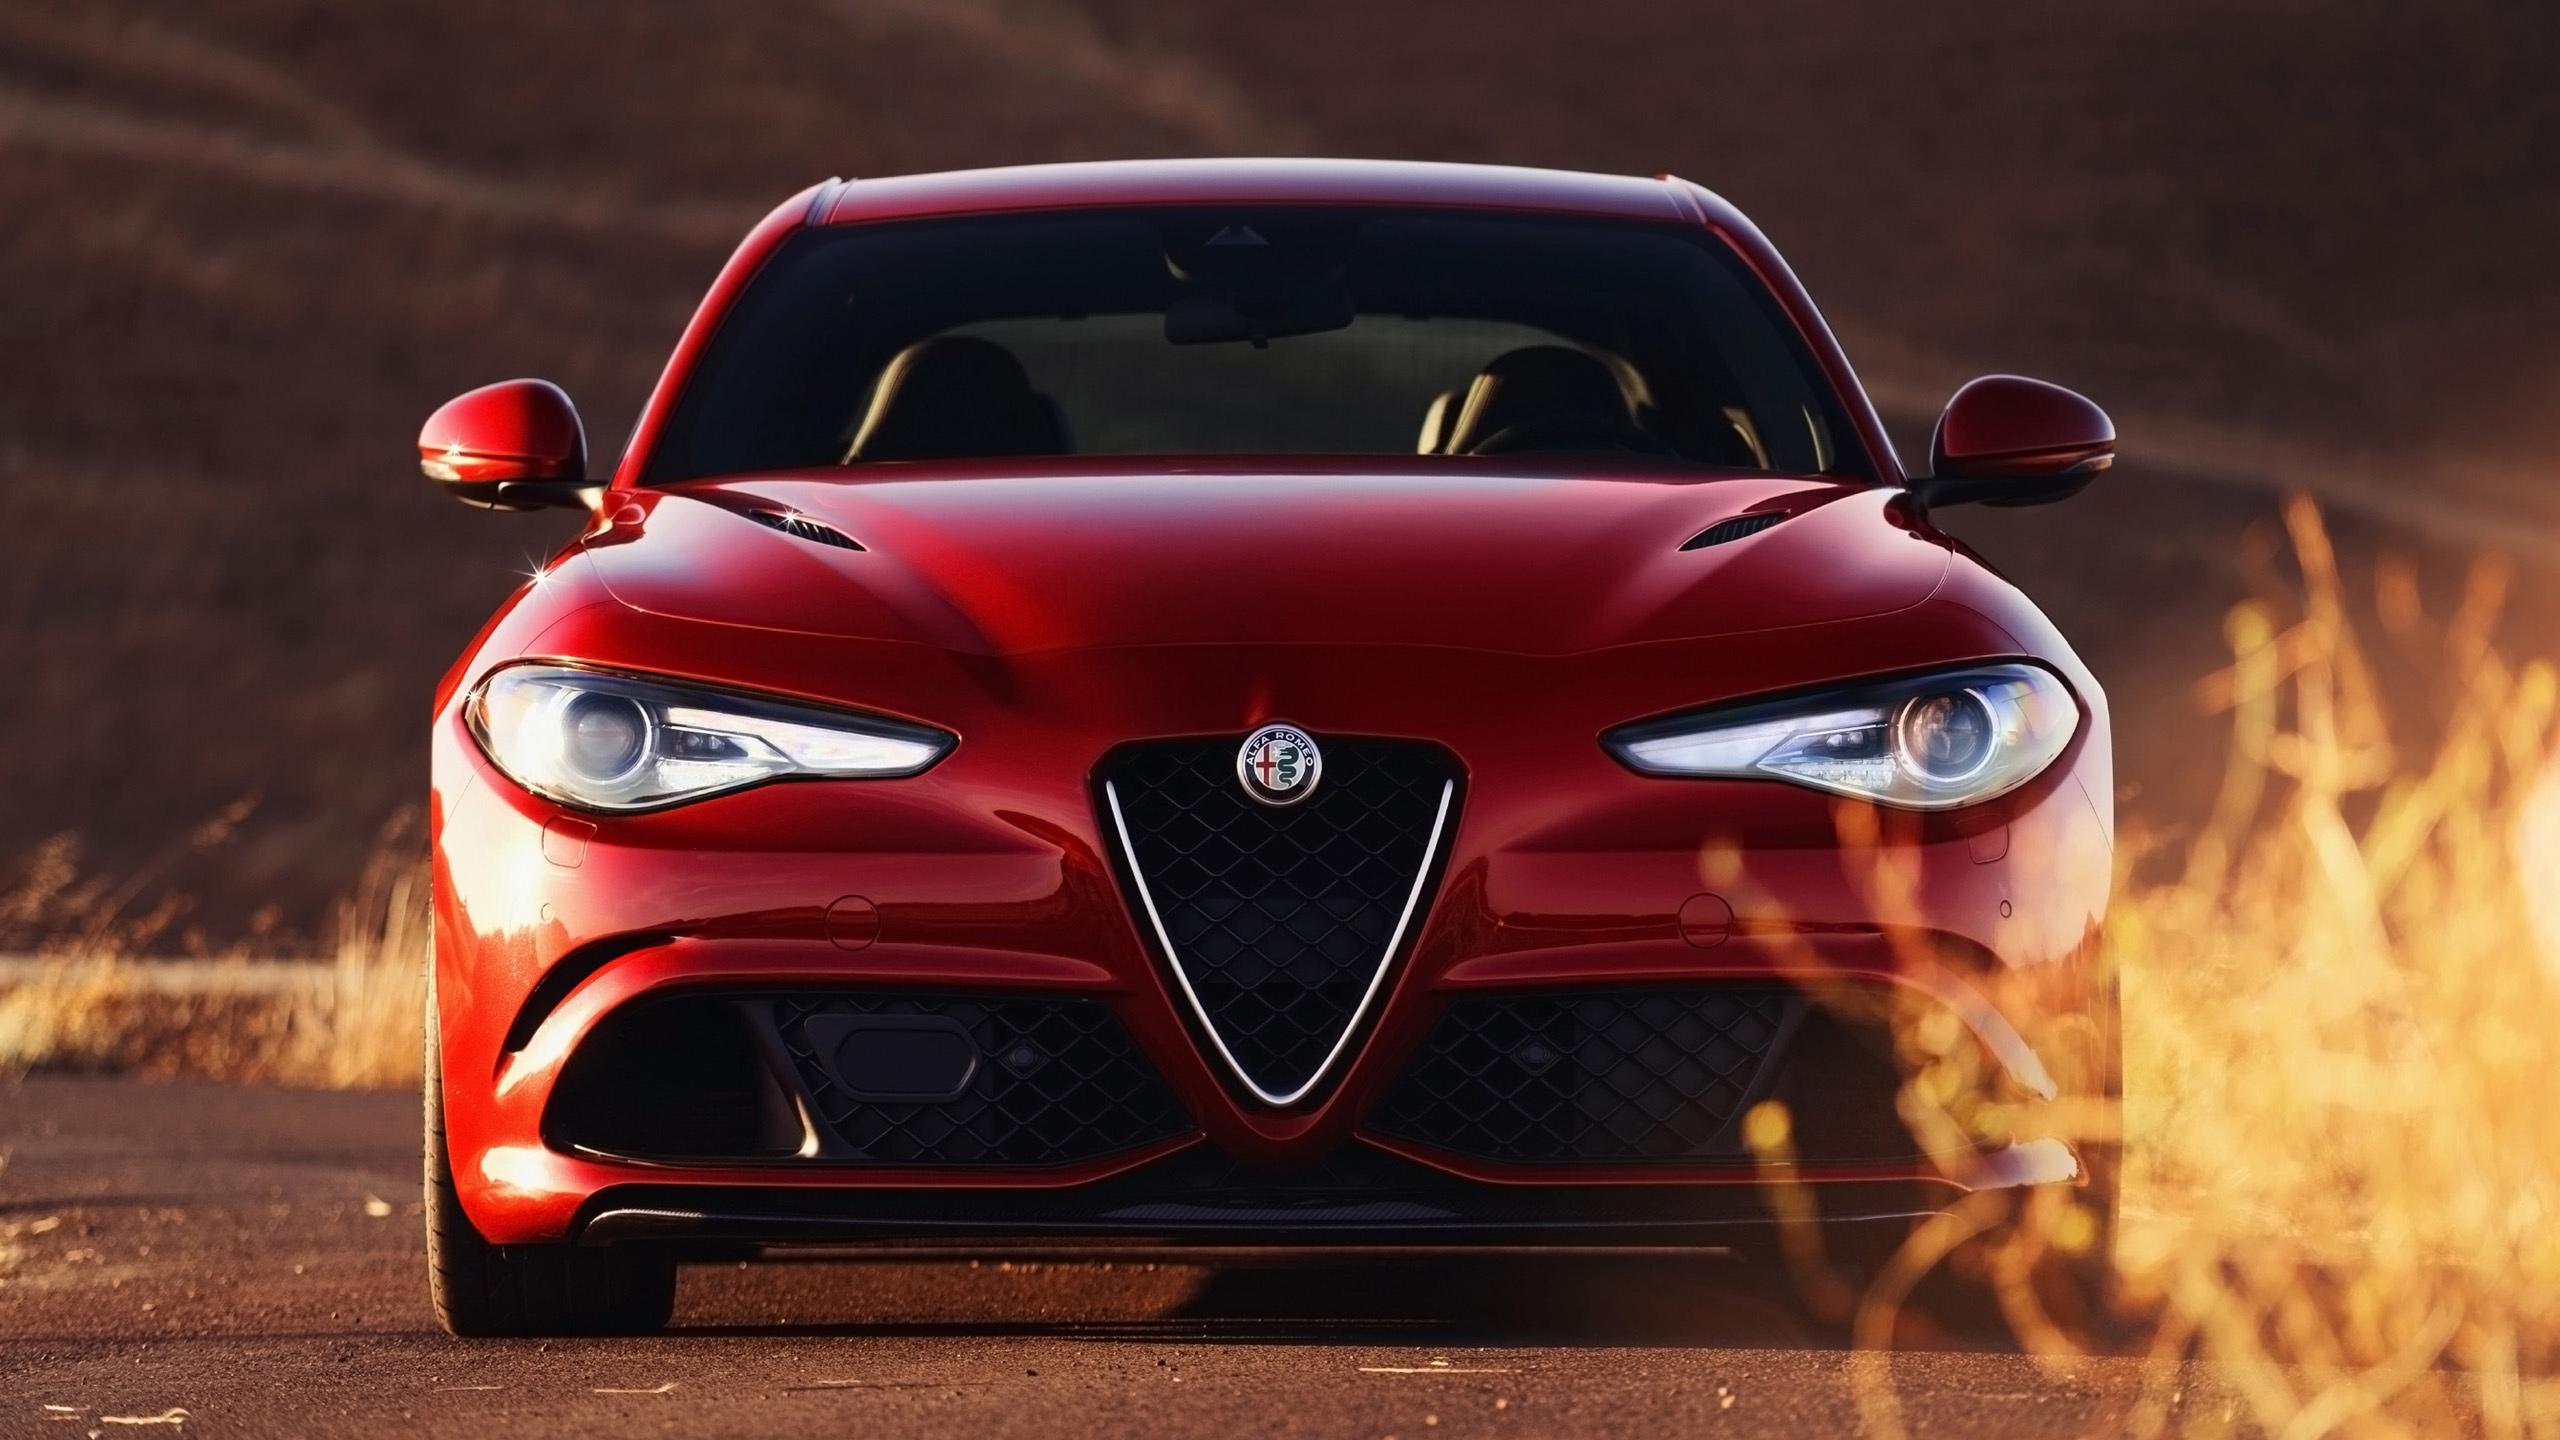 Ultra HD Alfa Romeo Giulia Wallpapers K75OU6B   4USkY 2560x1440